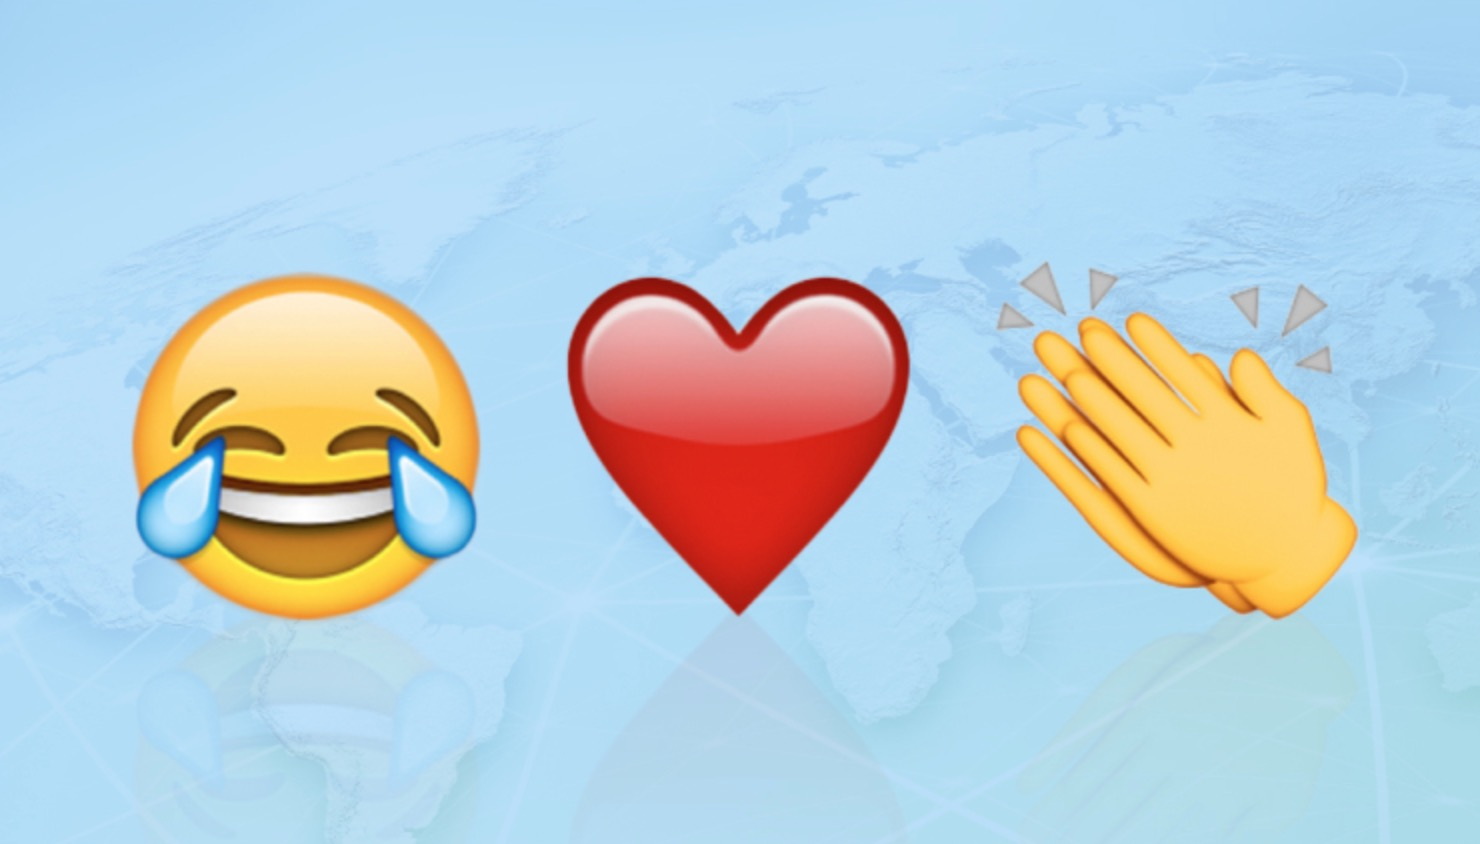 Le emoji più condivise su Facebook Messenger